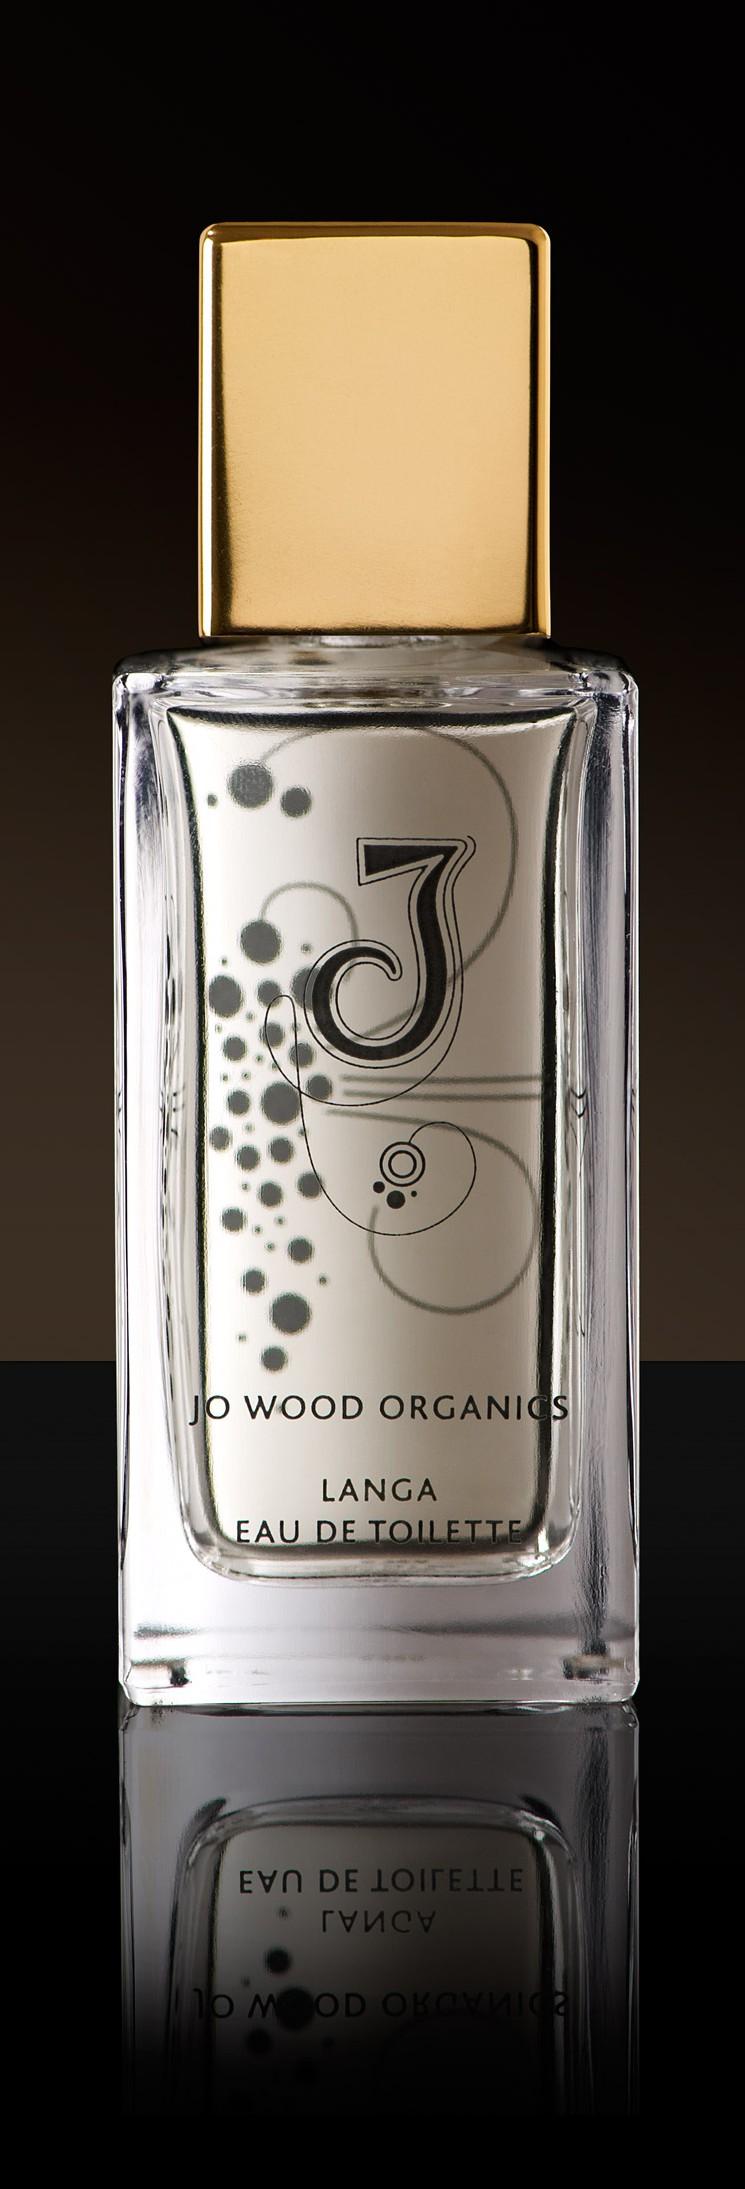 Jo Wood Organics Langa аромат для женщин